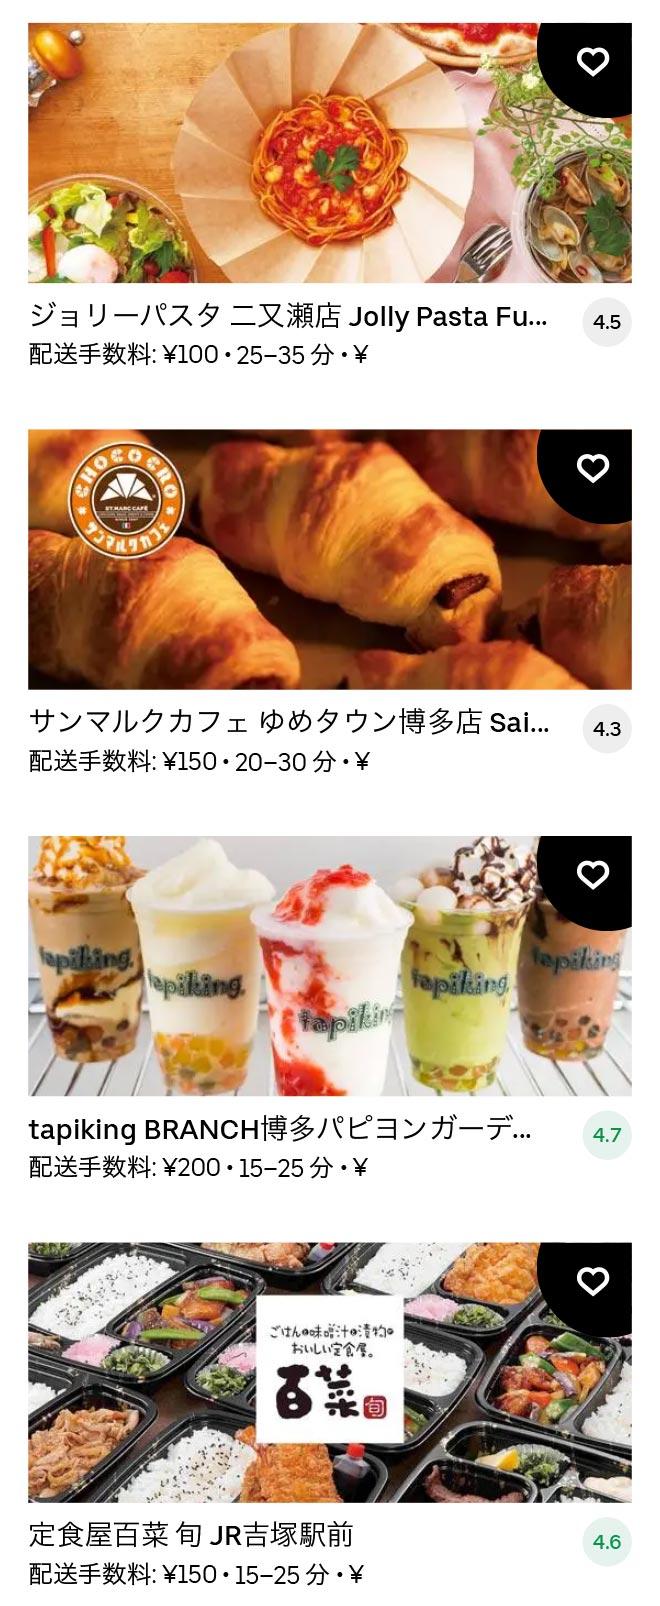 Hakozaki menu 2101 09